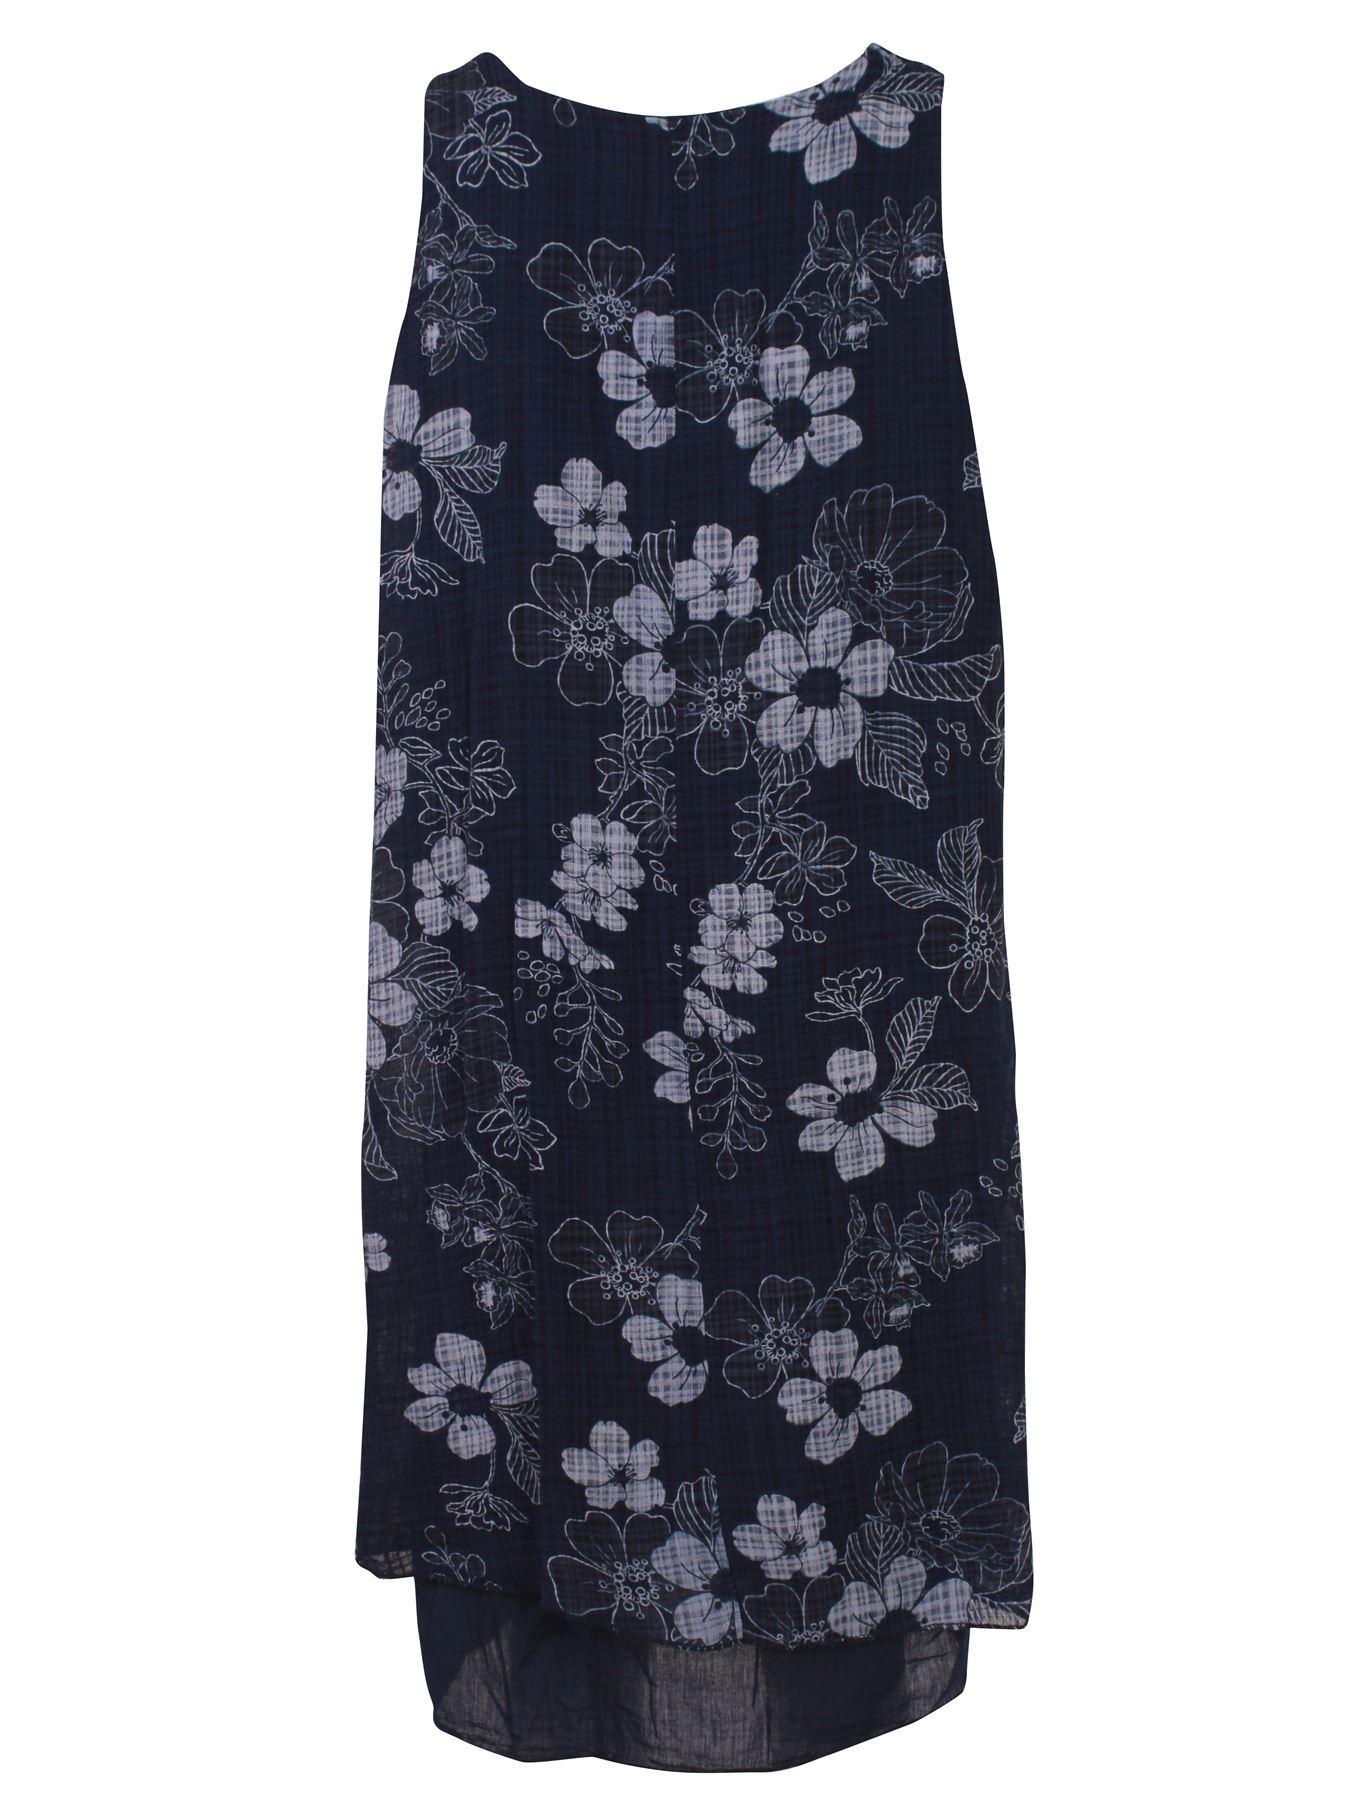 Womens-Floral-Print-Italian-Fashion-Lagenlook-Summer-Cotton-Crew-Neck-Dress thumbnail 24